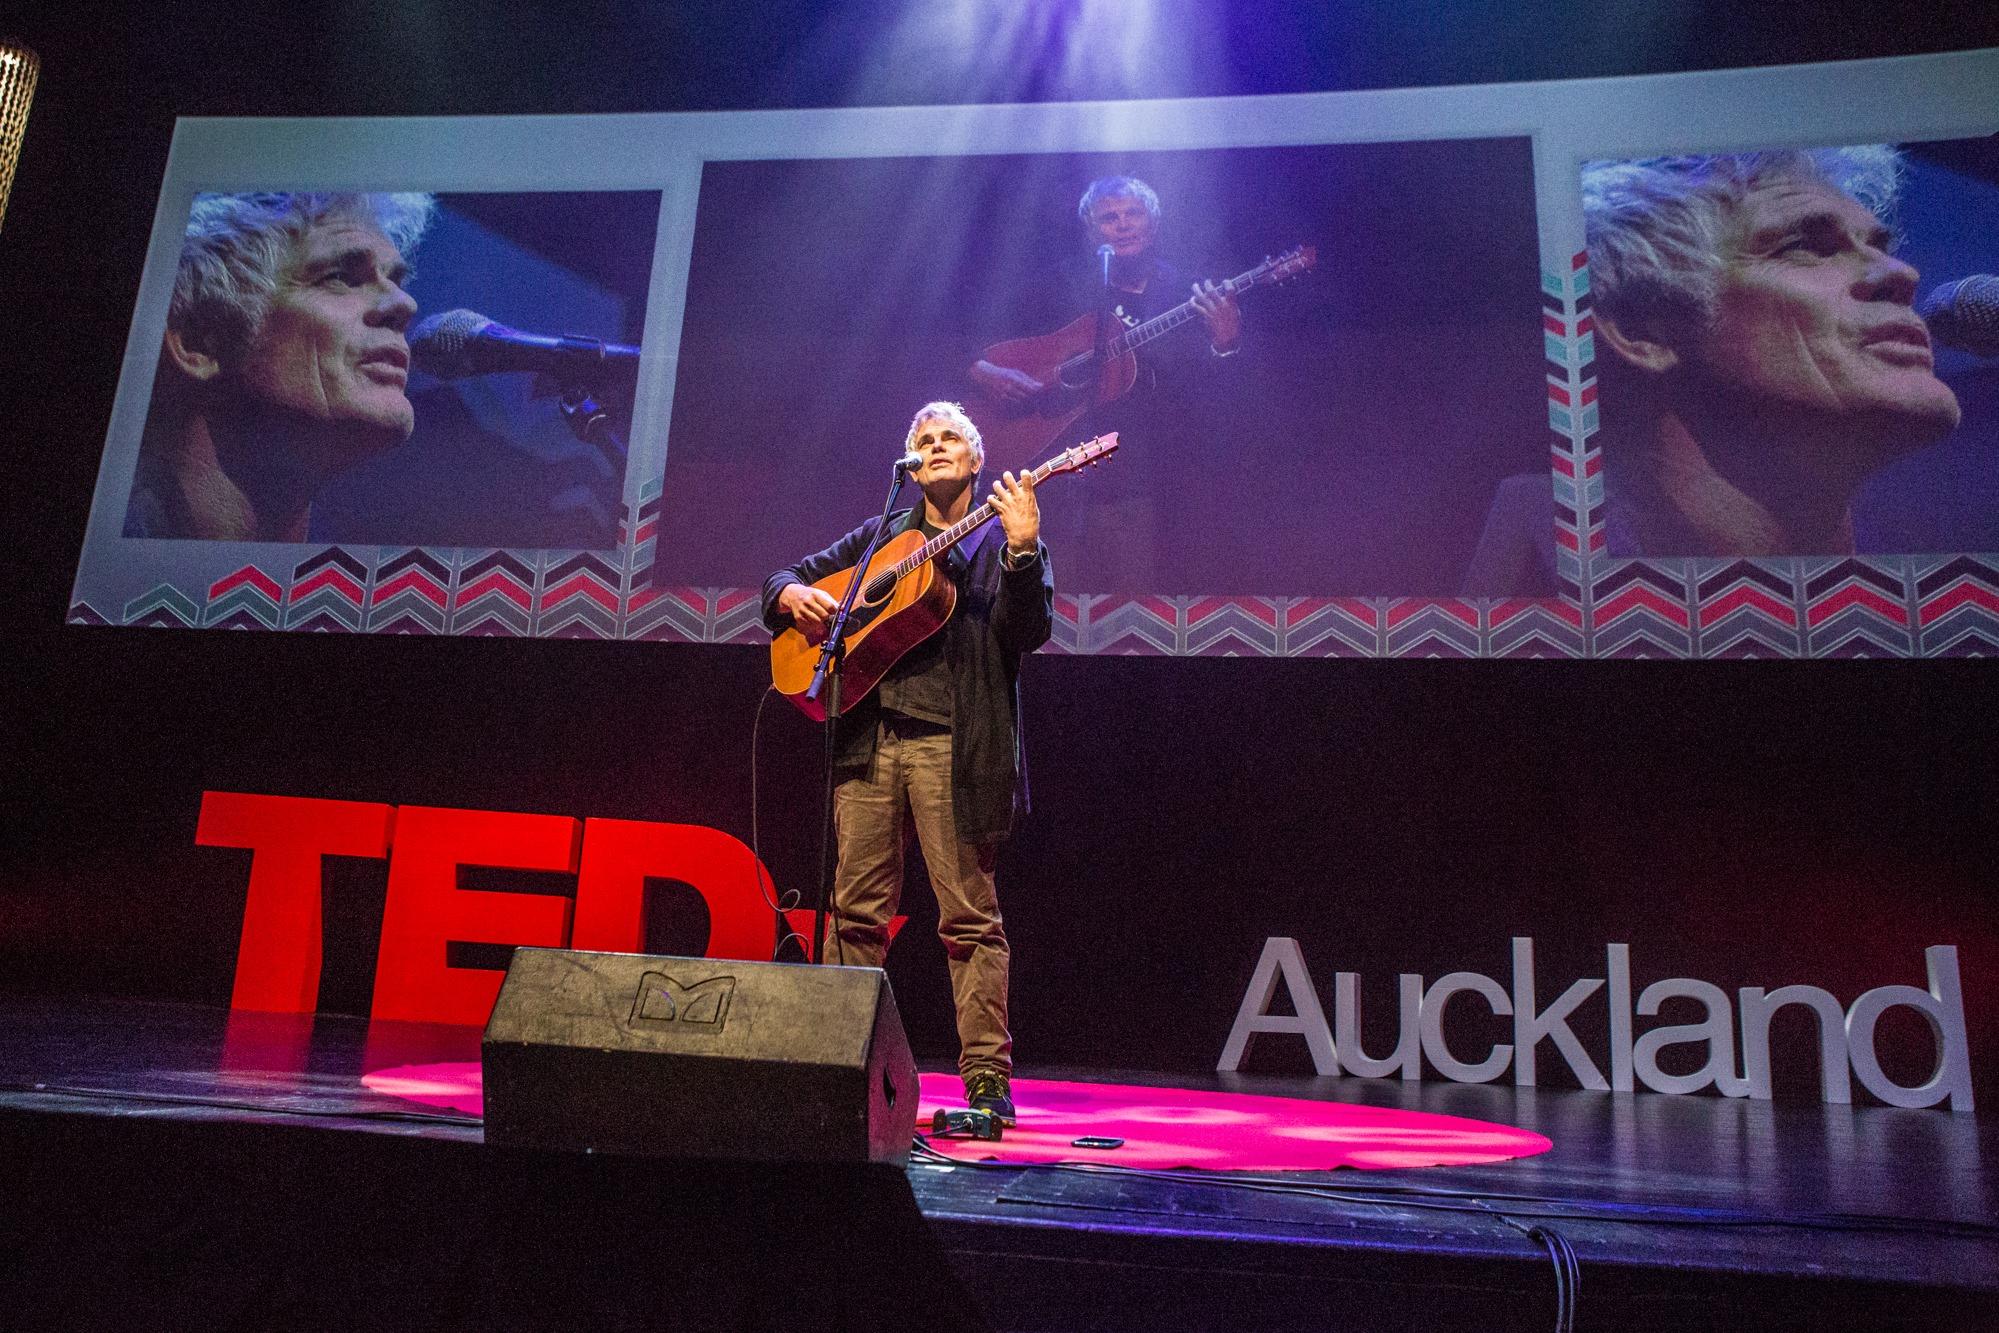 Georgina Schofield Photography - Live at TEDxAuckland 2014